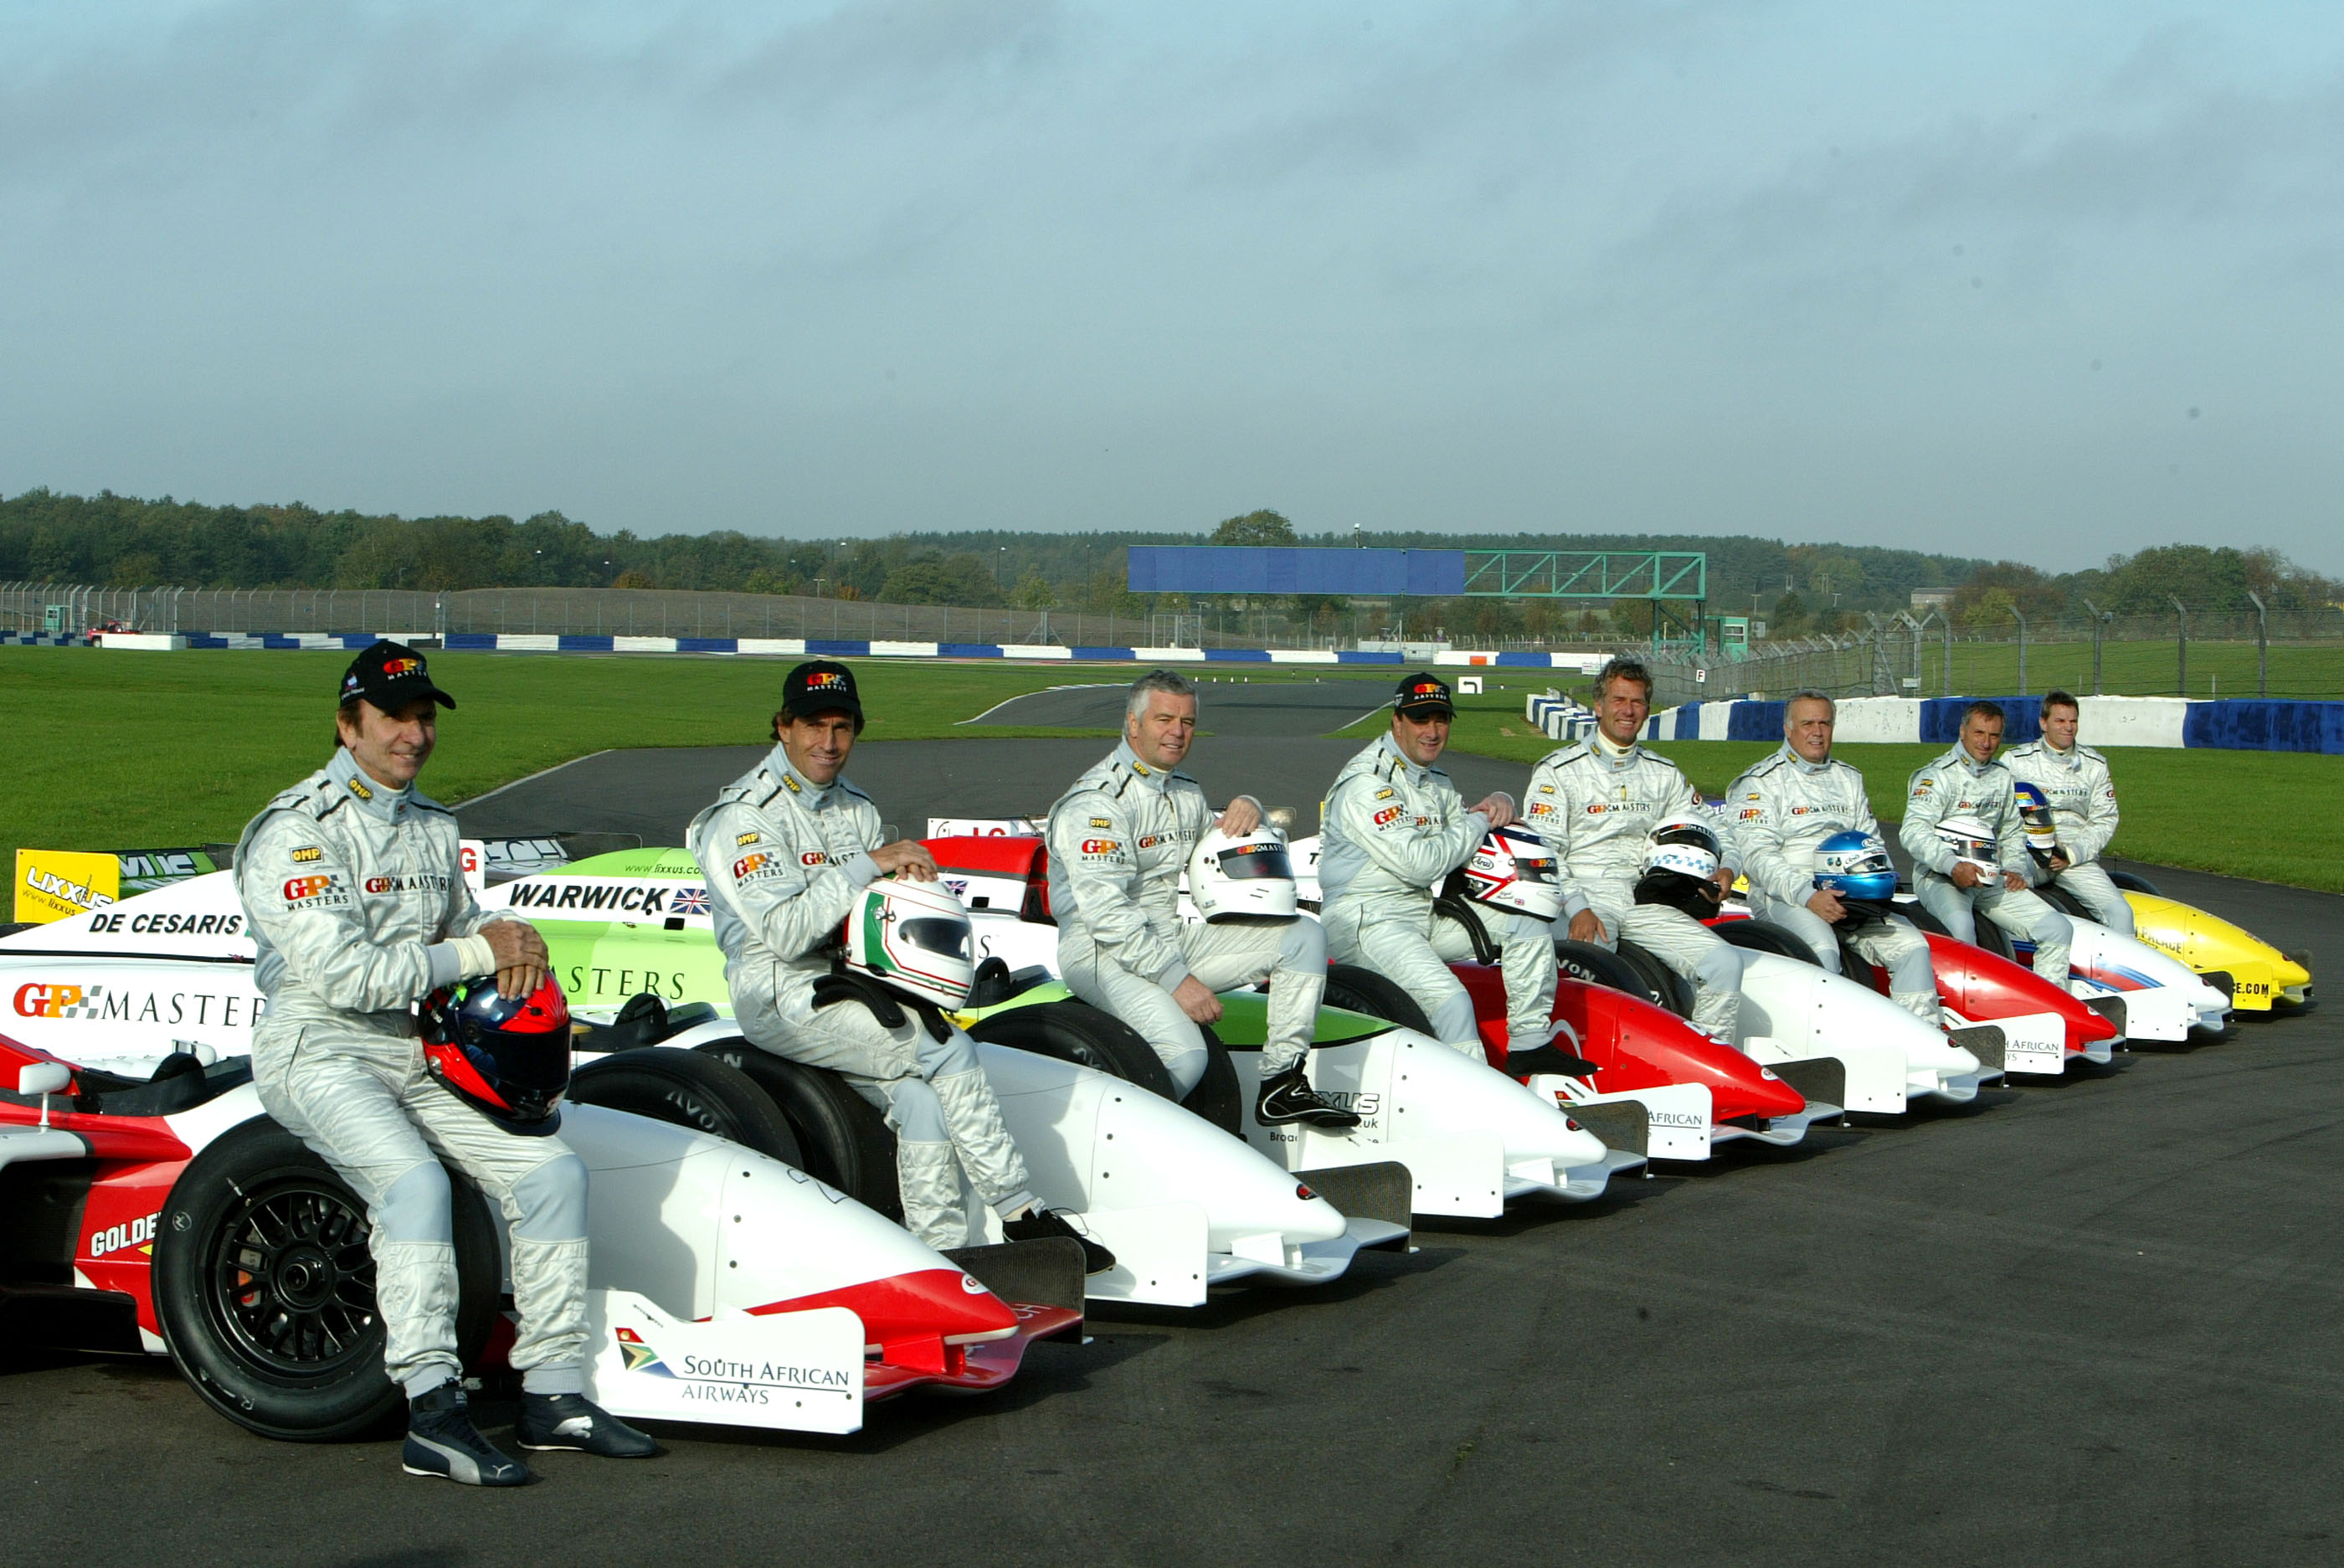 Gp Masters Testing, Silverstone